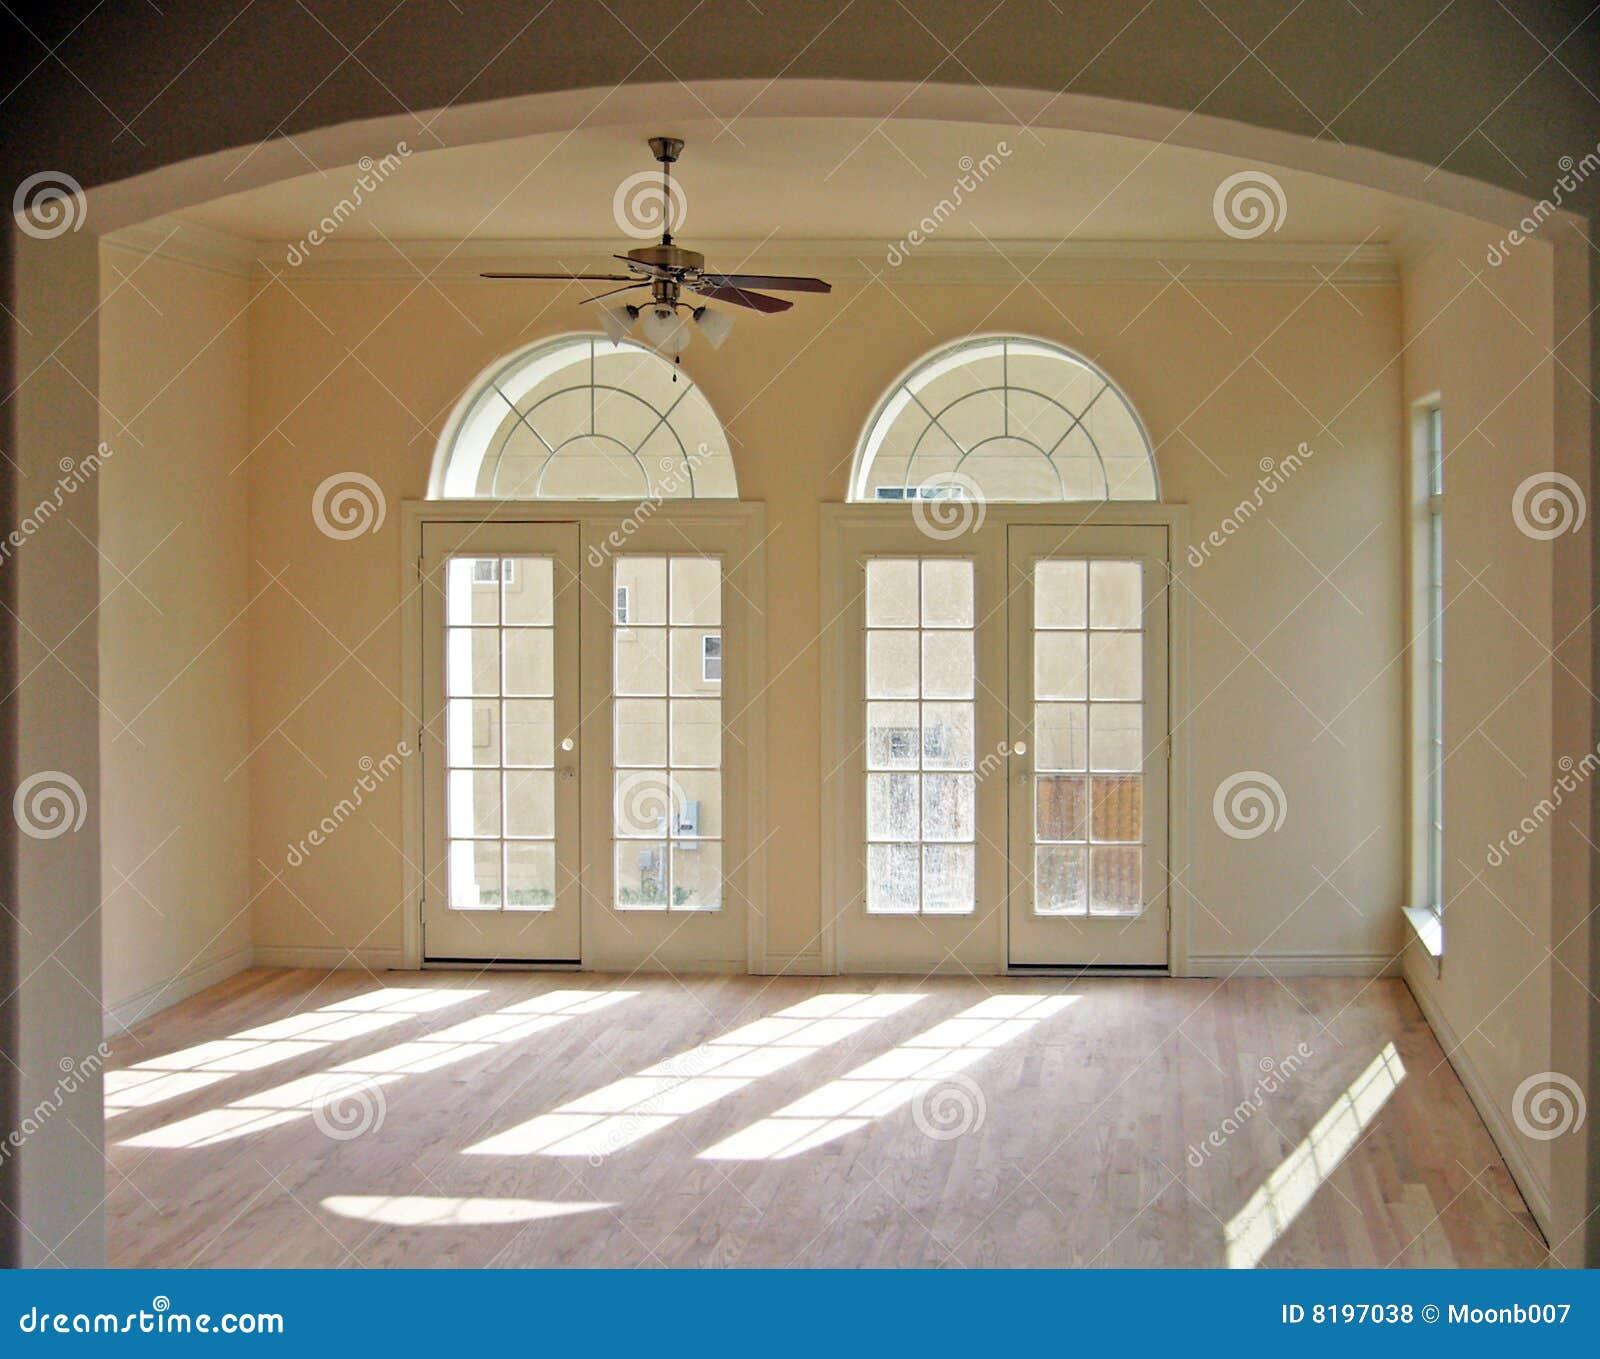 Empty Living Room: Empty Living Room Stock Photo. Image Of Living, Flooring